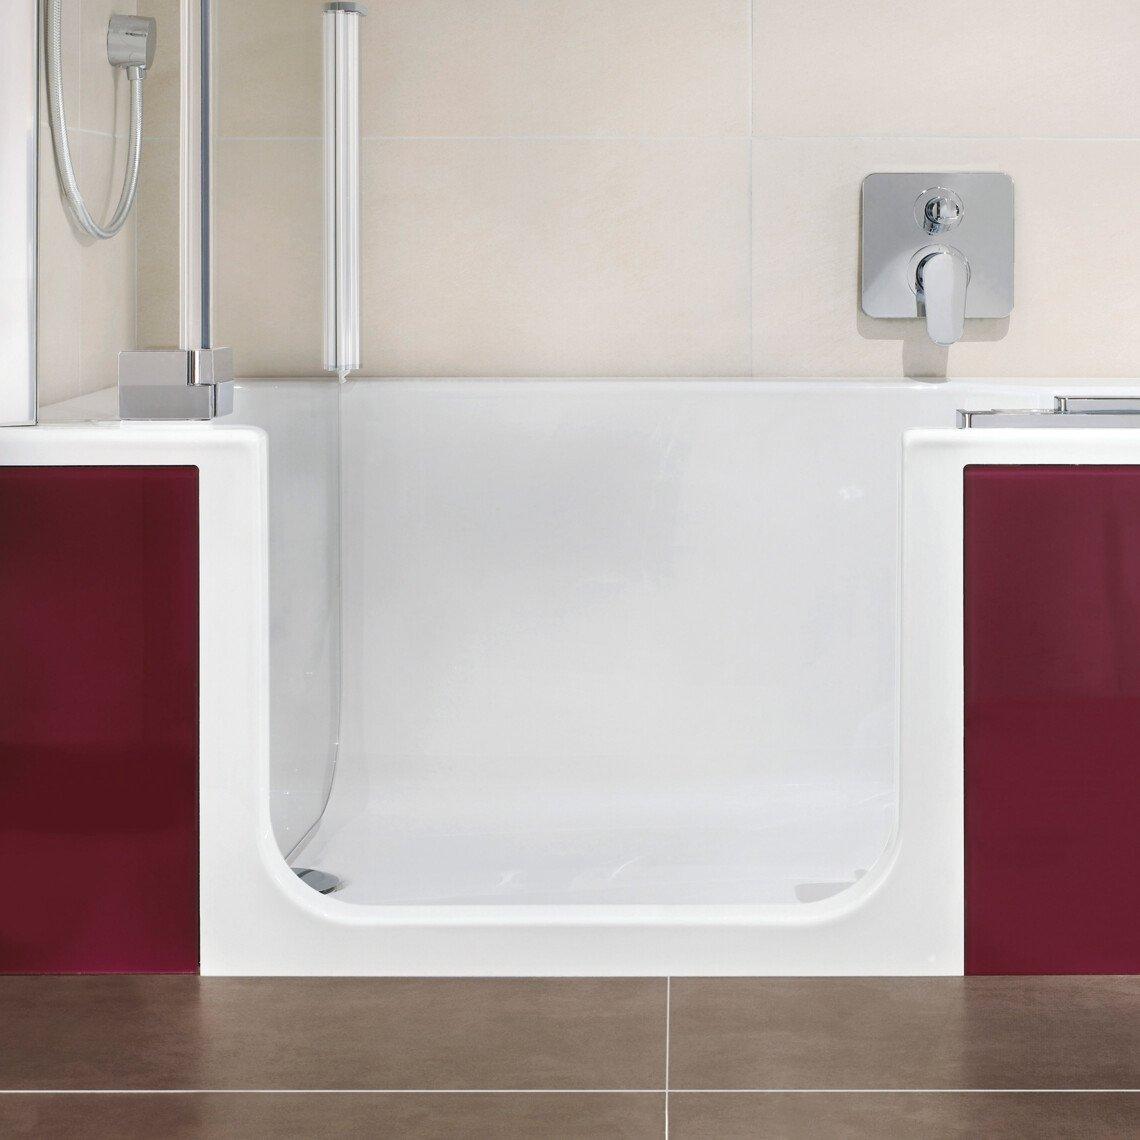 barrierefreies bad tipps f r die planung artweger. Black Bedroom Furniture Sets. Home Design Ideas